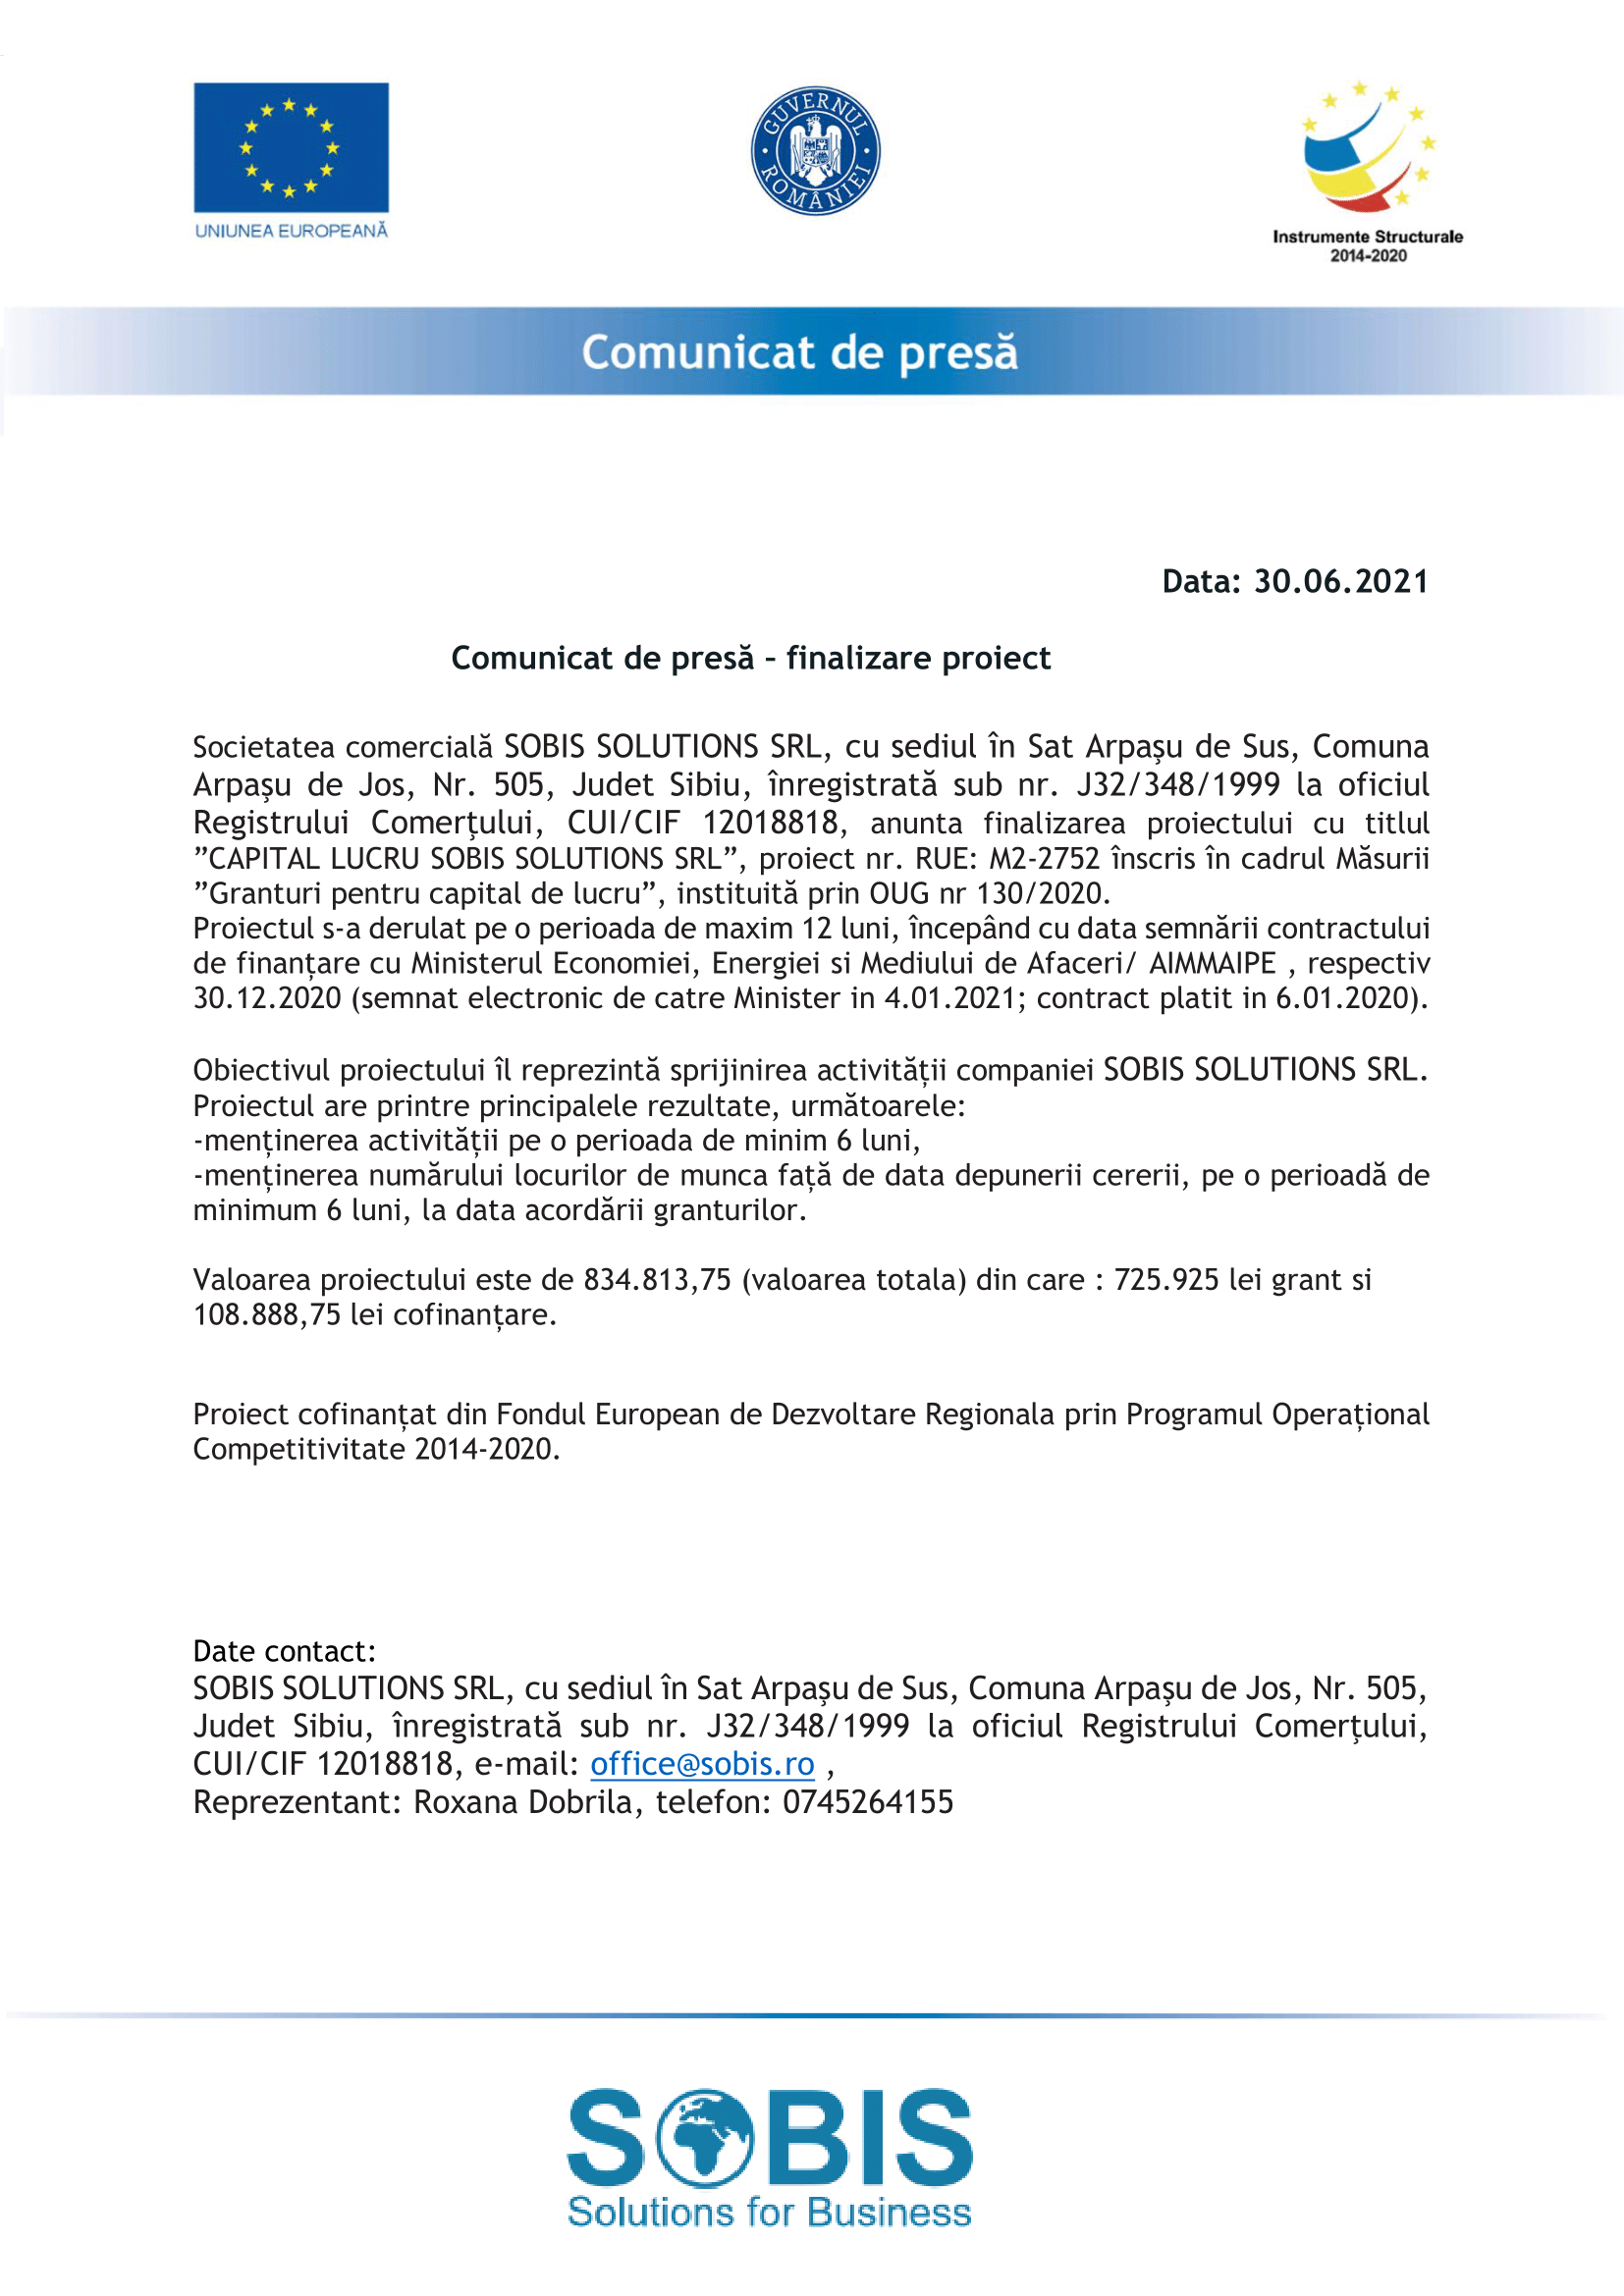 Comunicat de Presa - finalizare proiect SOBIS-1